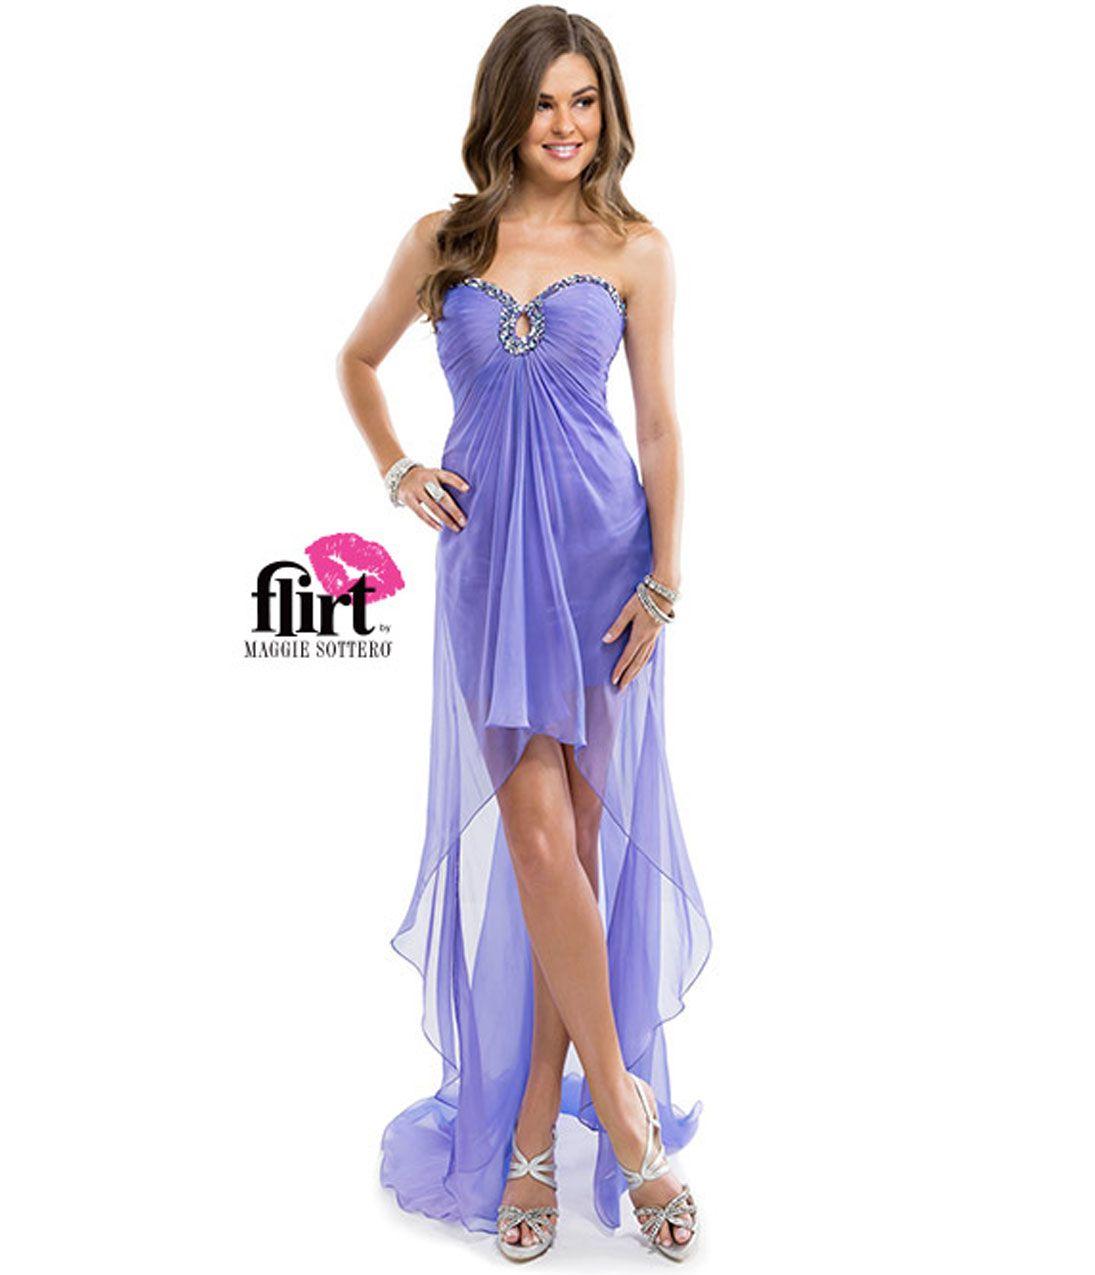 Loving the lavenderperiwinkle color tones formal elegance